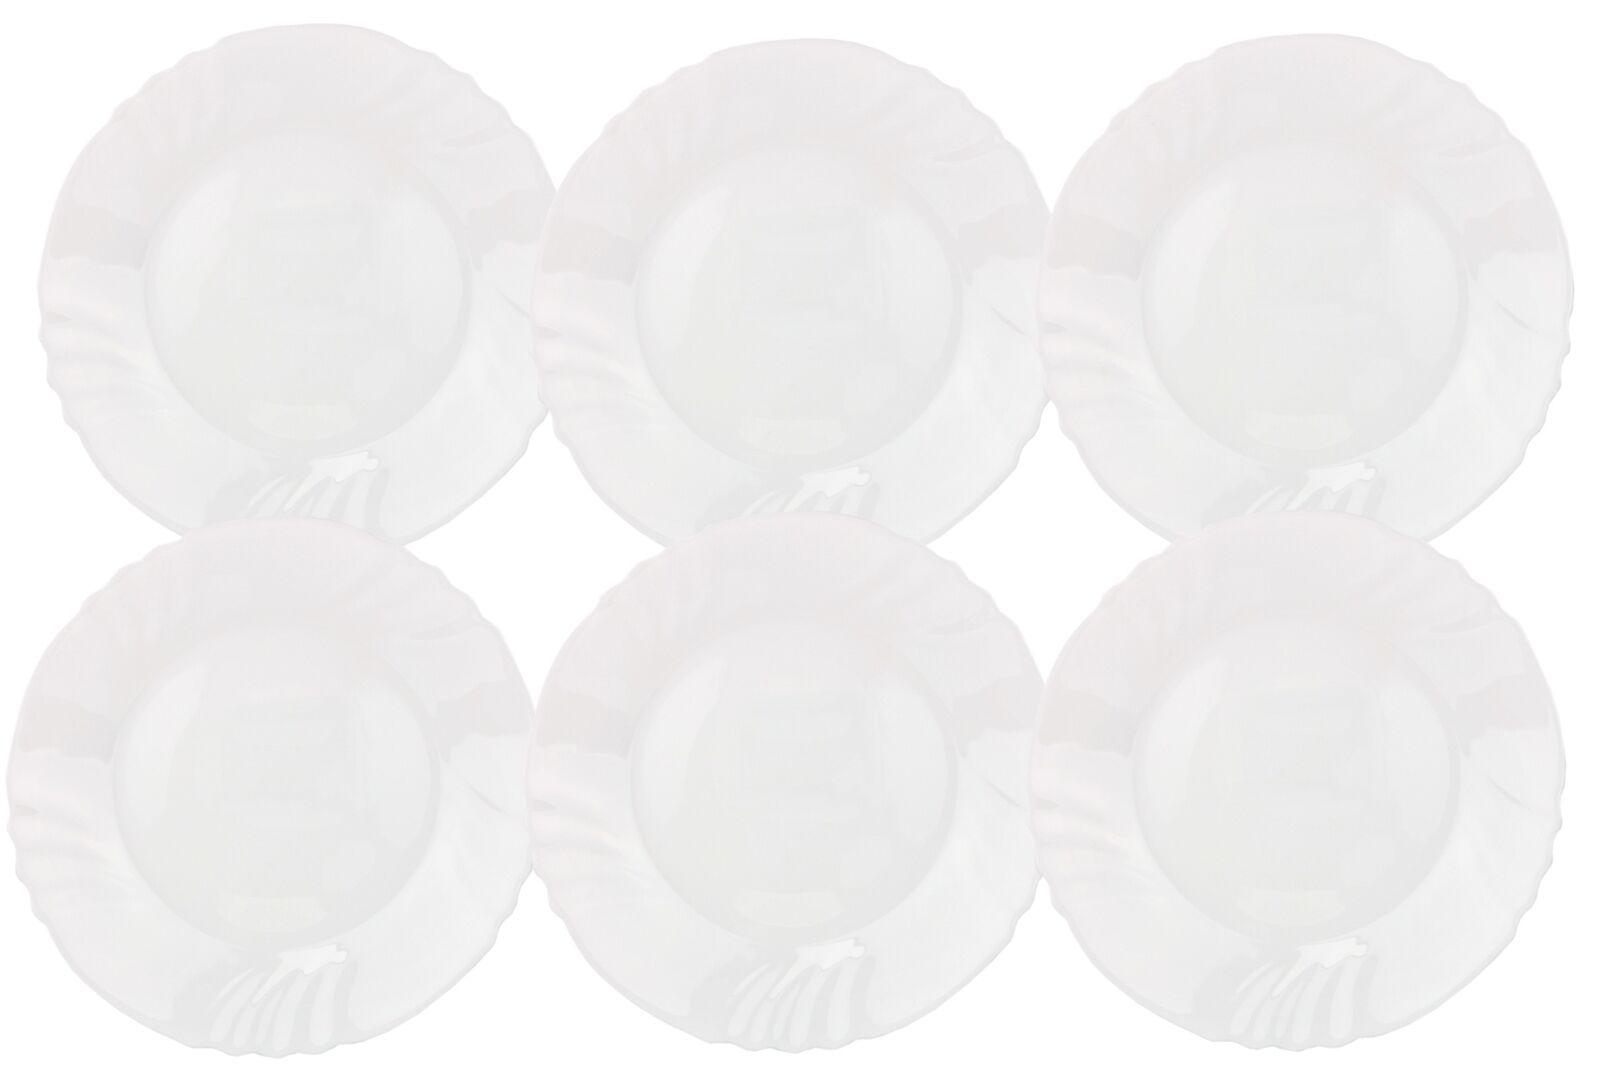 6er Set Dessertteller Ebro Kuchenteller Frühstücksteller Hartglas weiß 20cm Neu